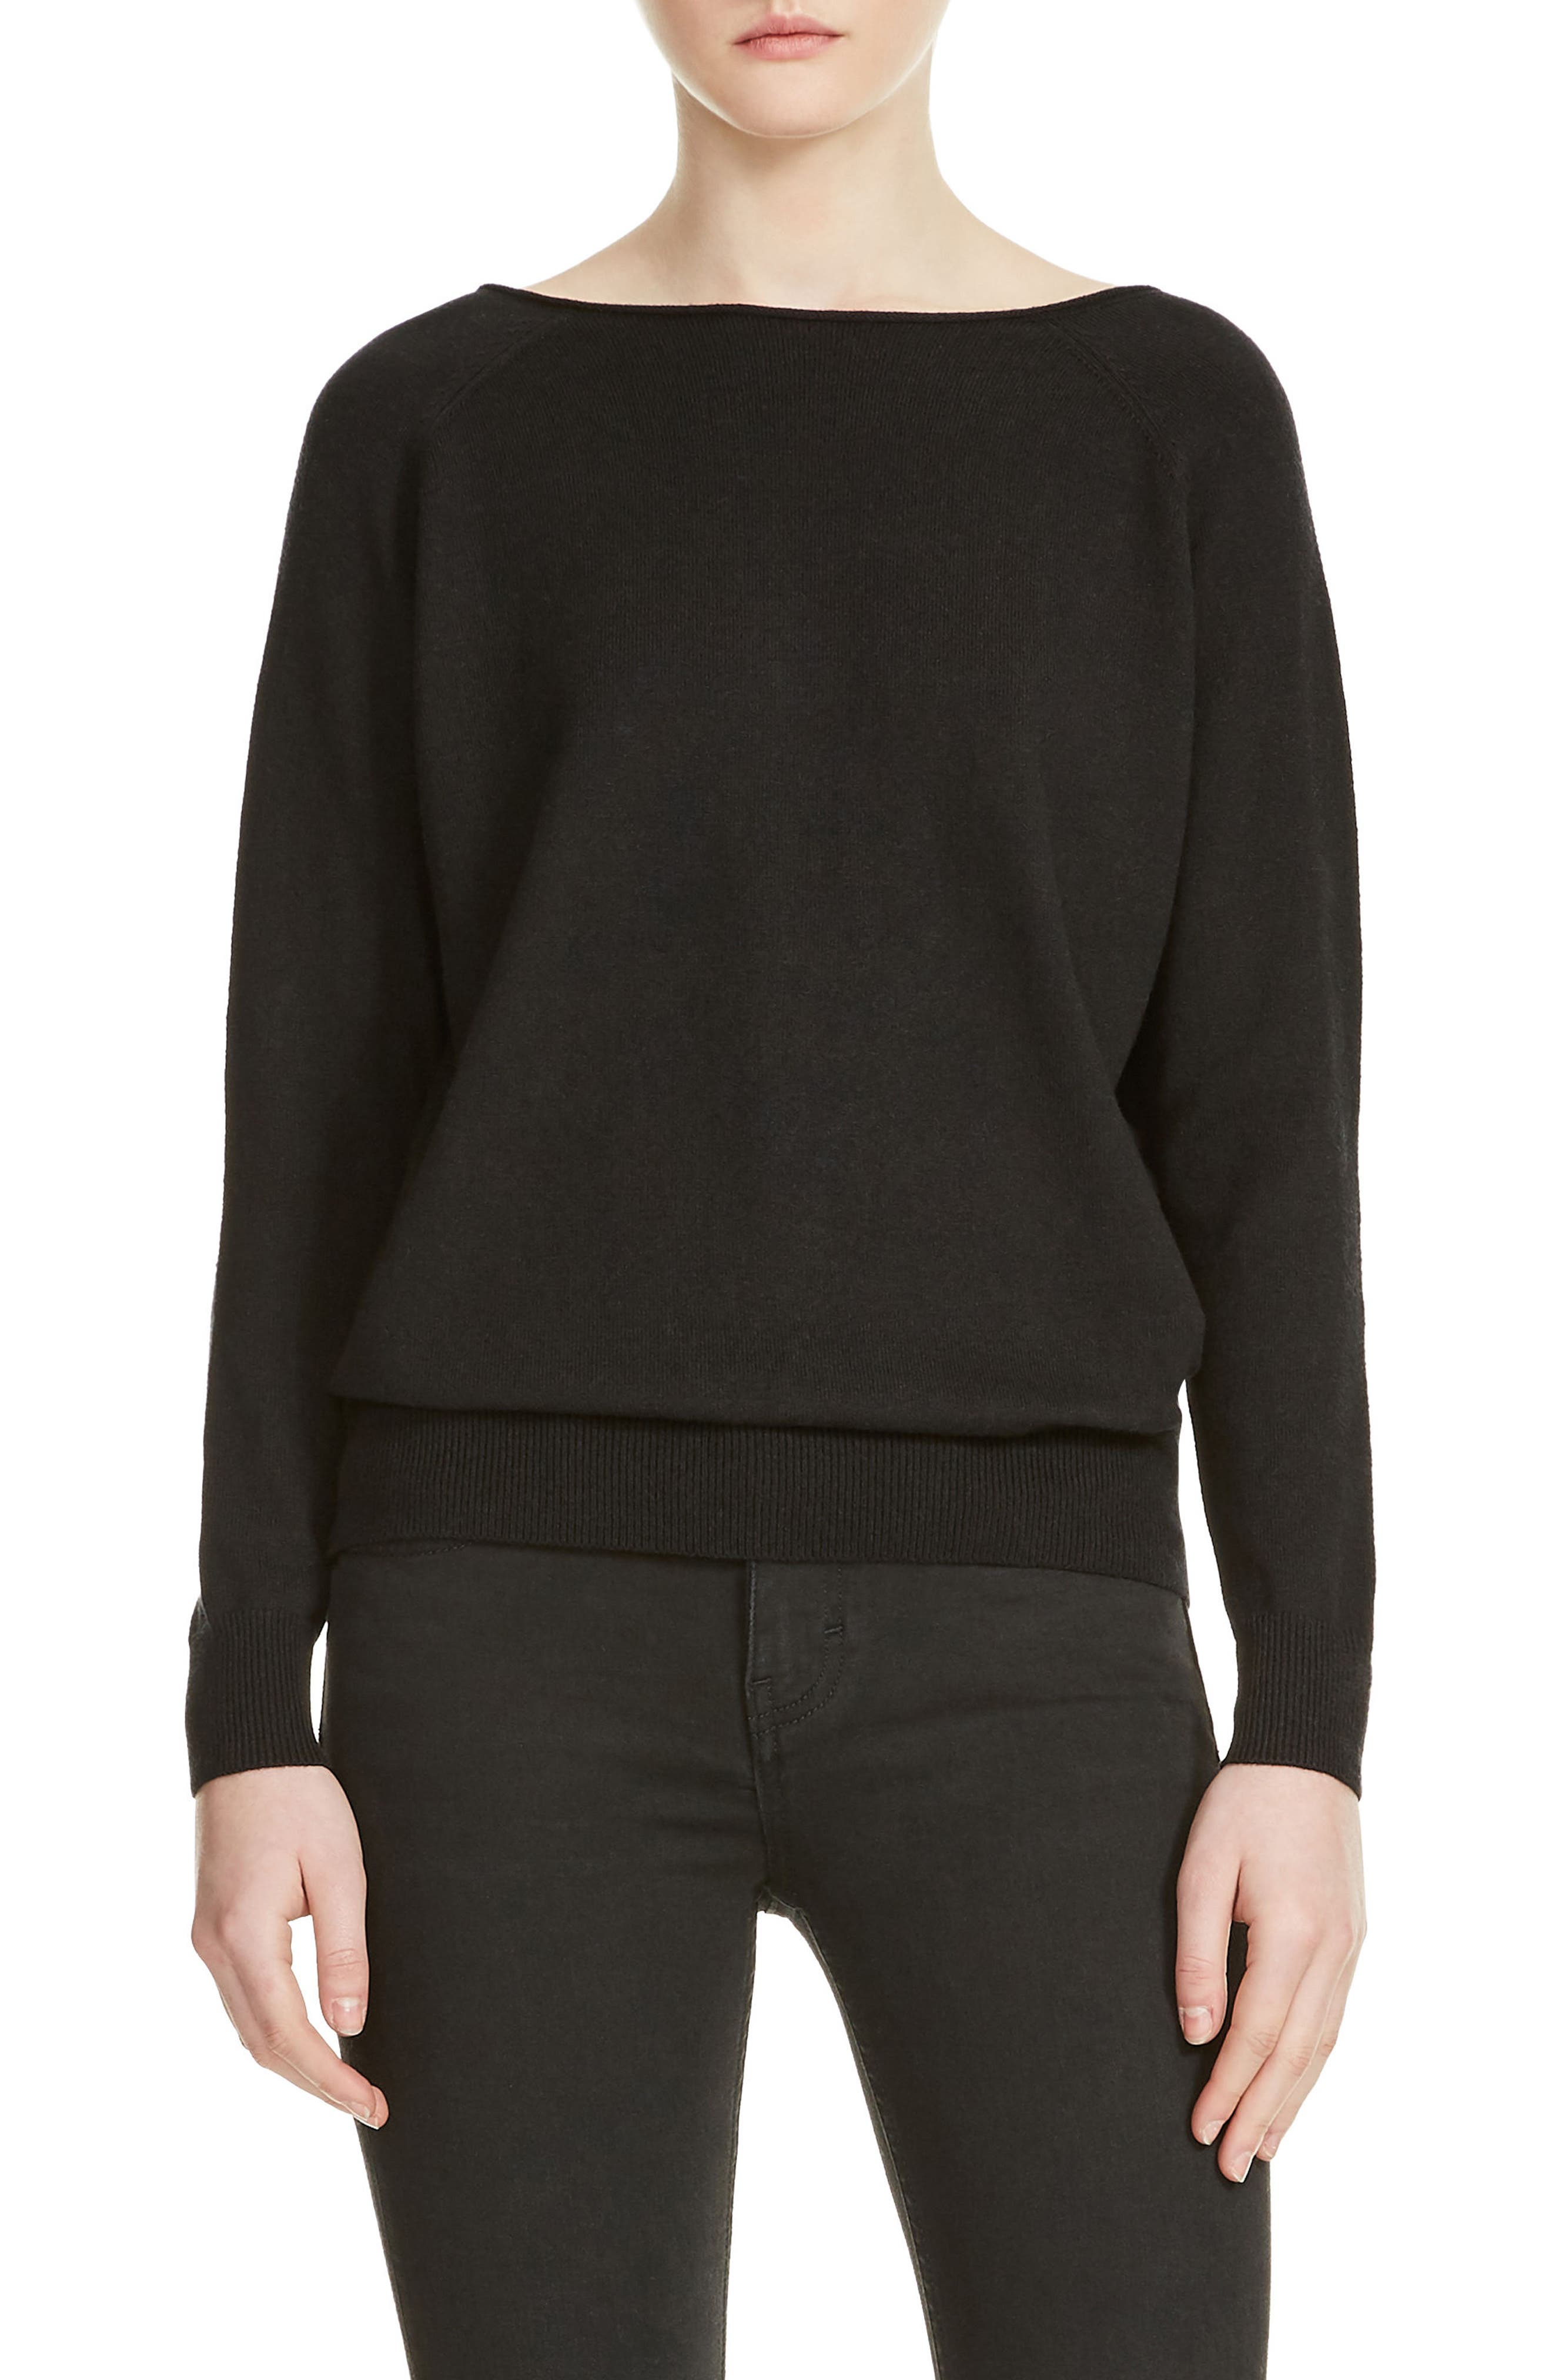 Macademia Chain Back Sweater,                         Main,                         color, Black